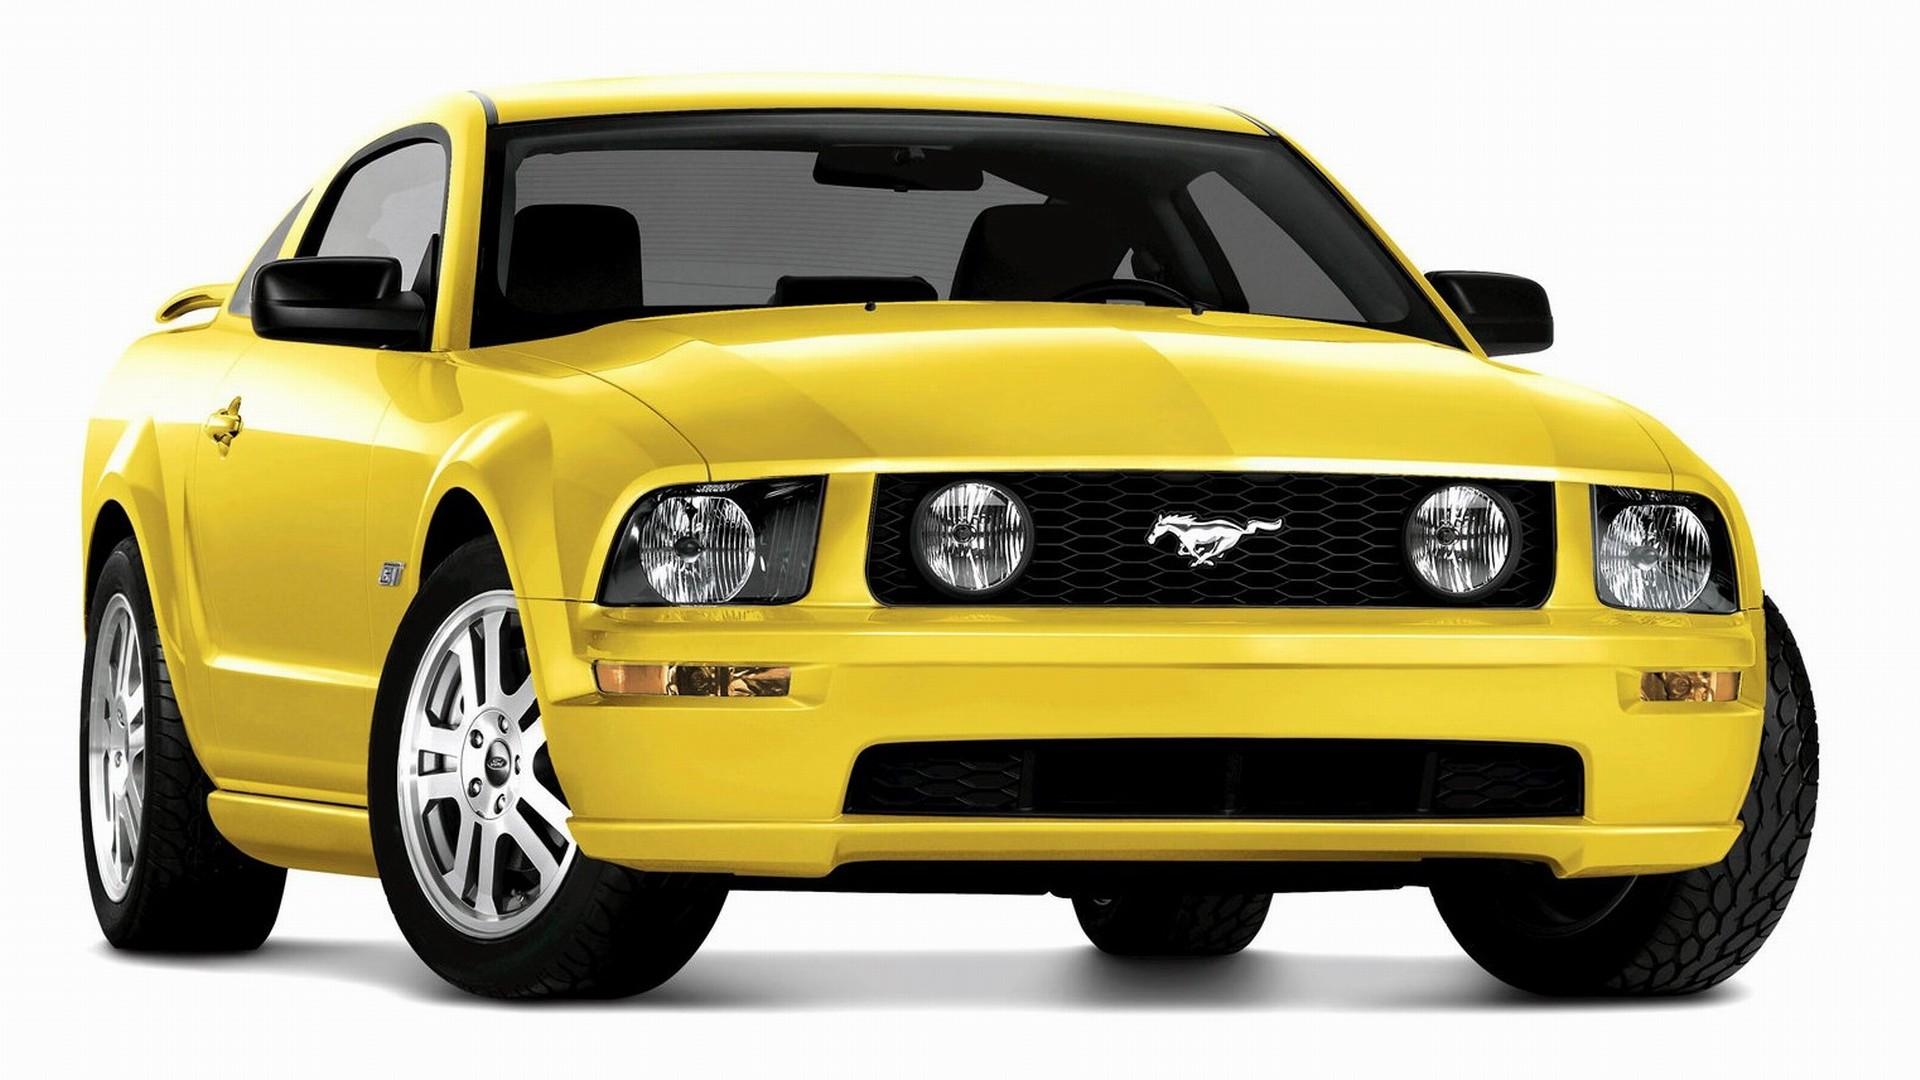 Ford Mustang GT 2005 30 1920x1080 WallpapersFord Mustang 1920x1080 1920x1080